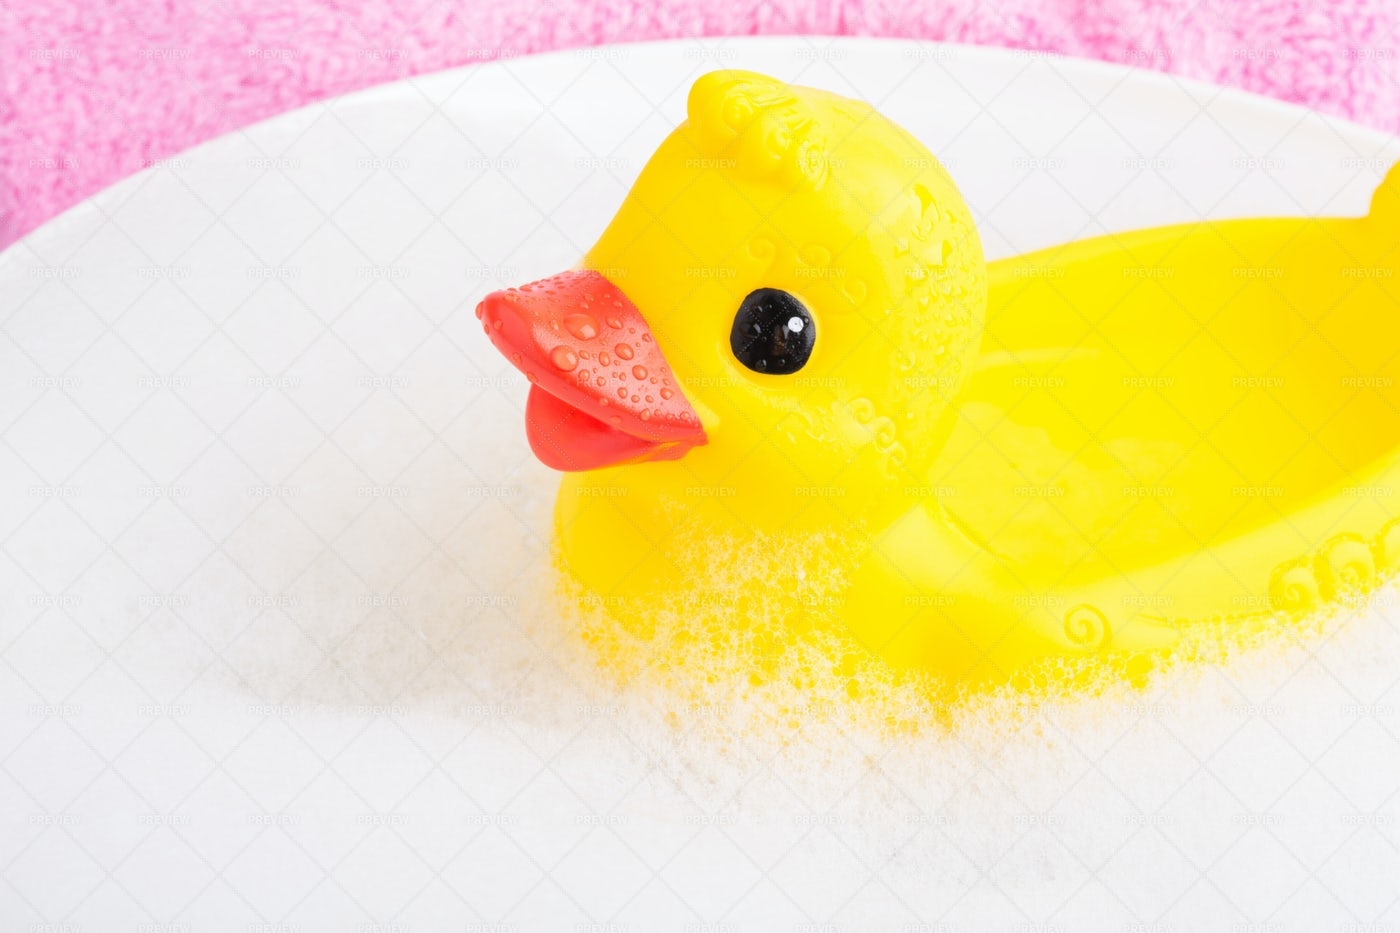 Rubber Duck In The Bath: Stock Photos